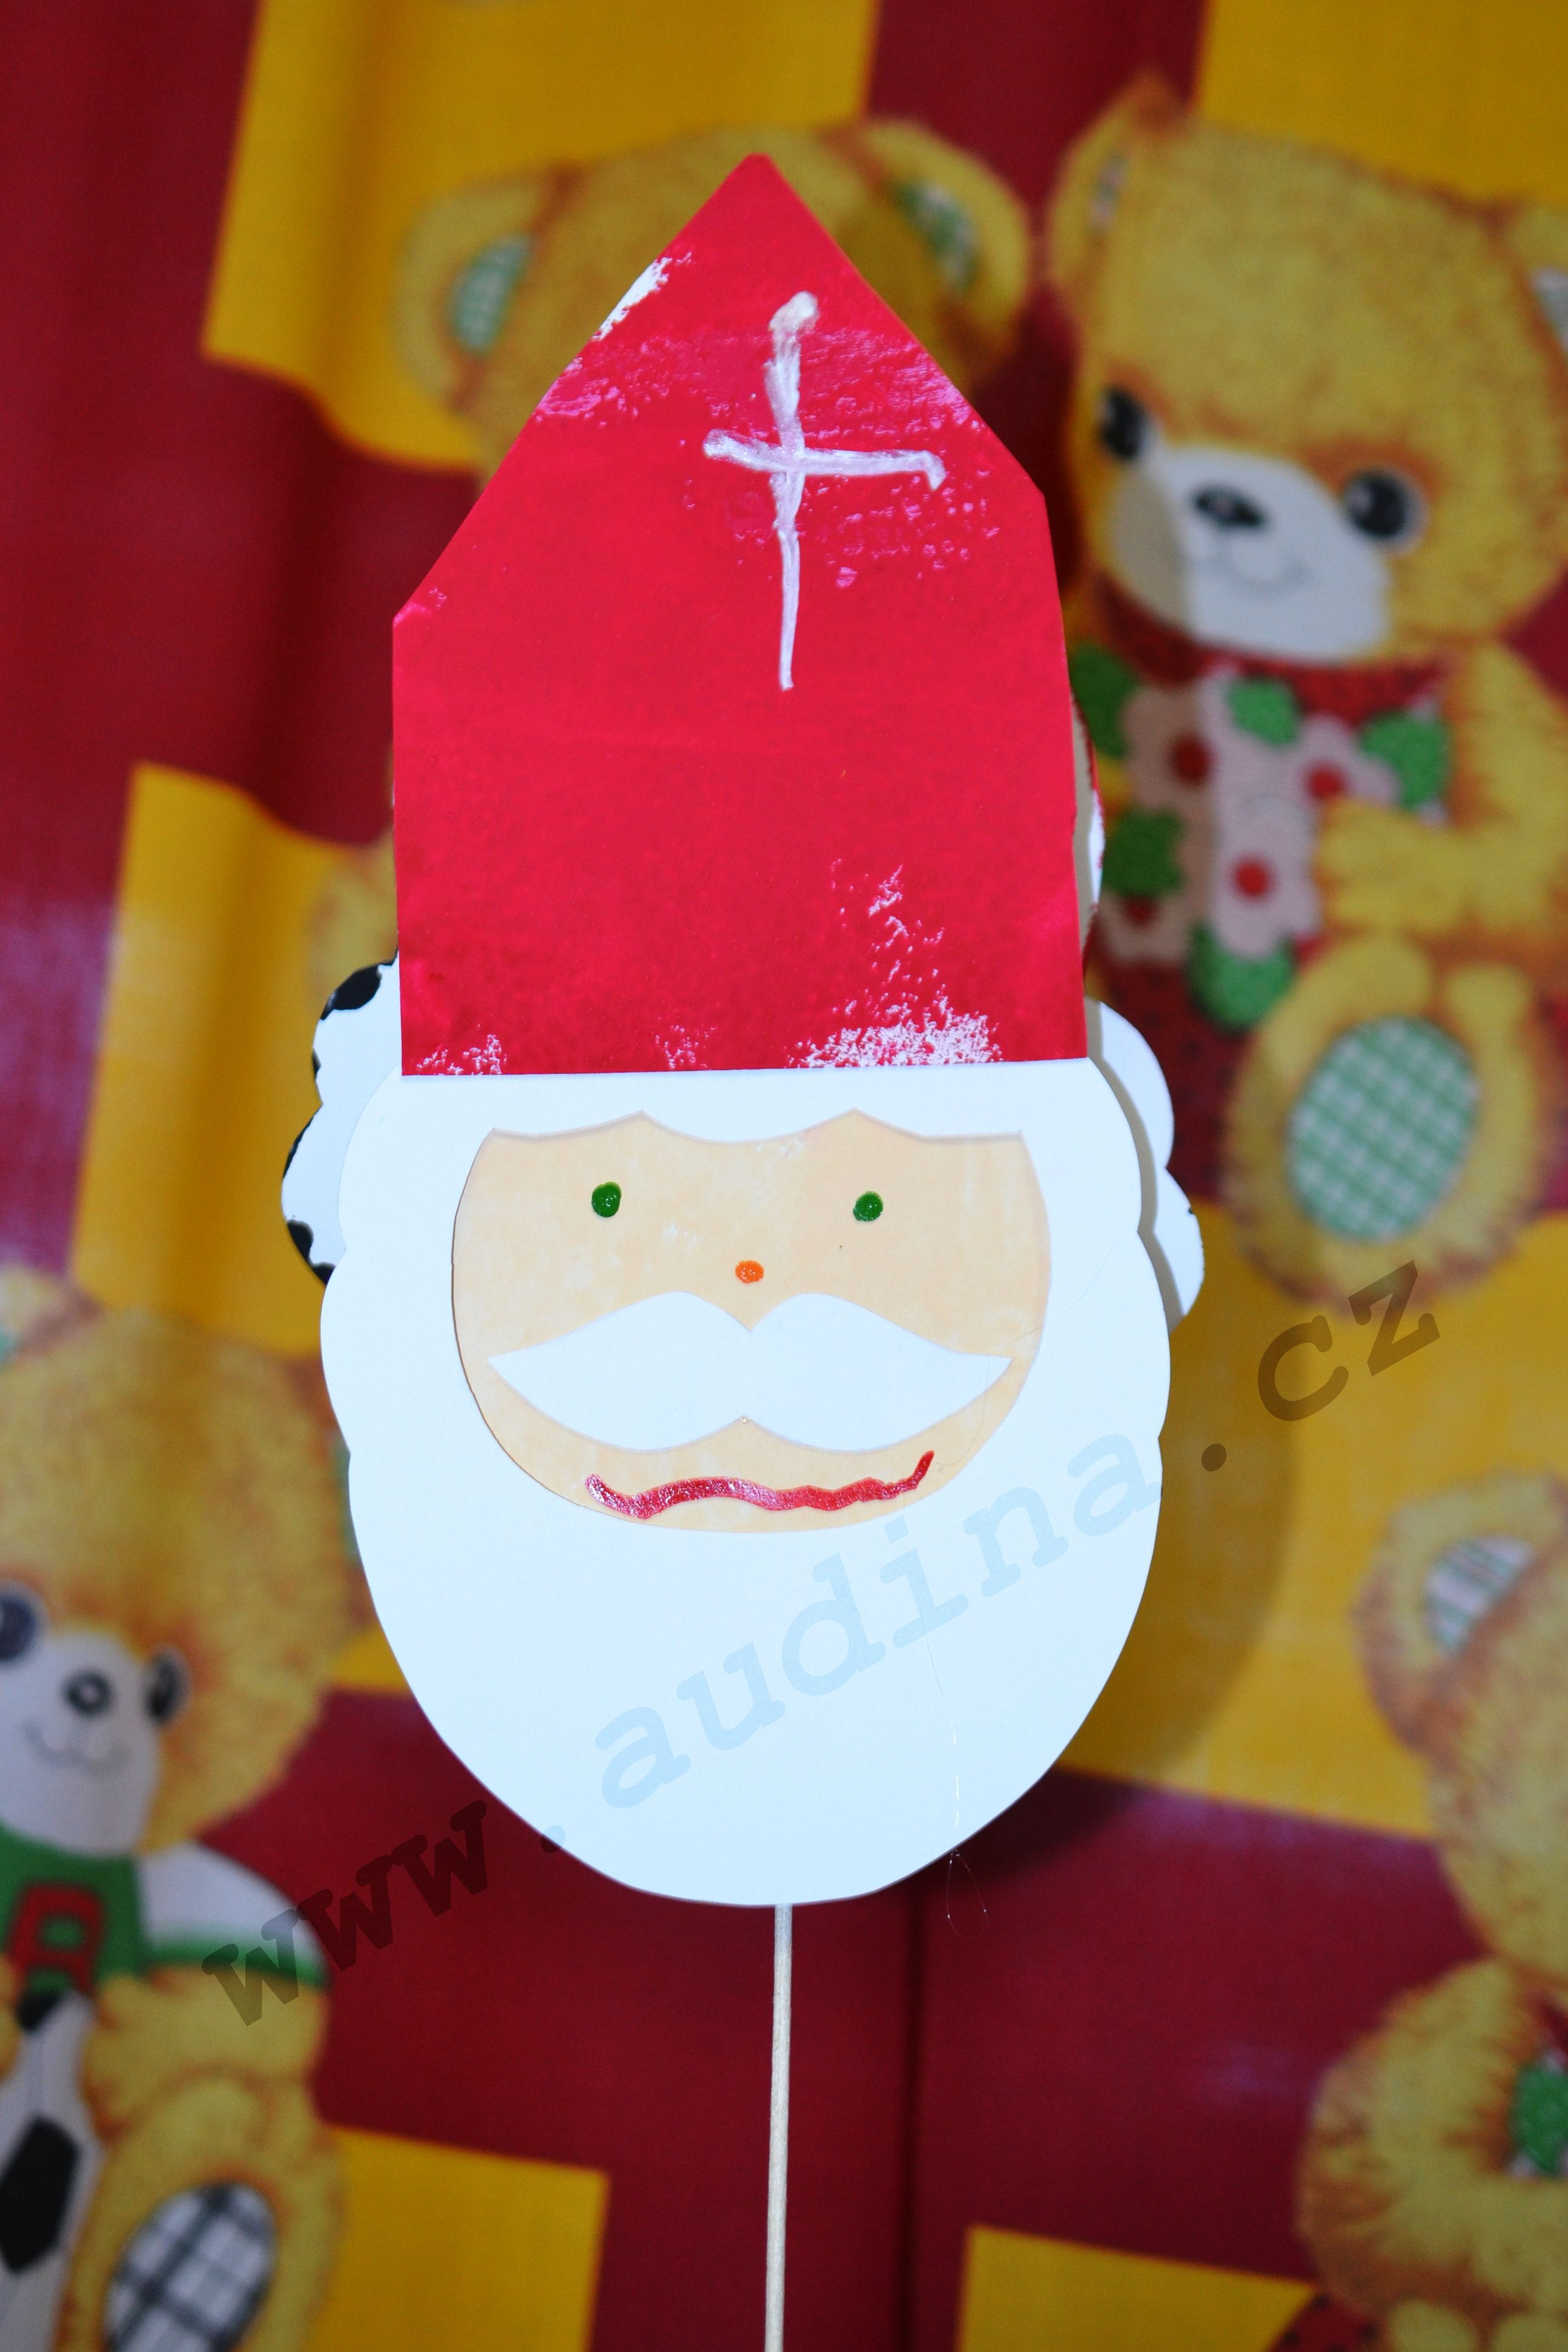 Pin On Zimni Tvo Eni S D Tmi Winter Kids Crafts